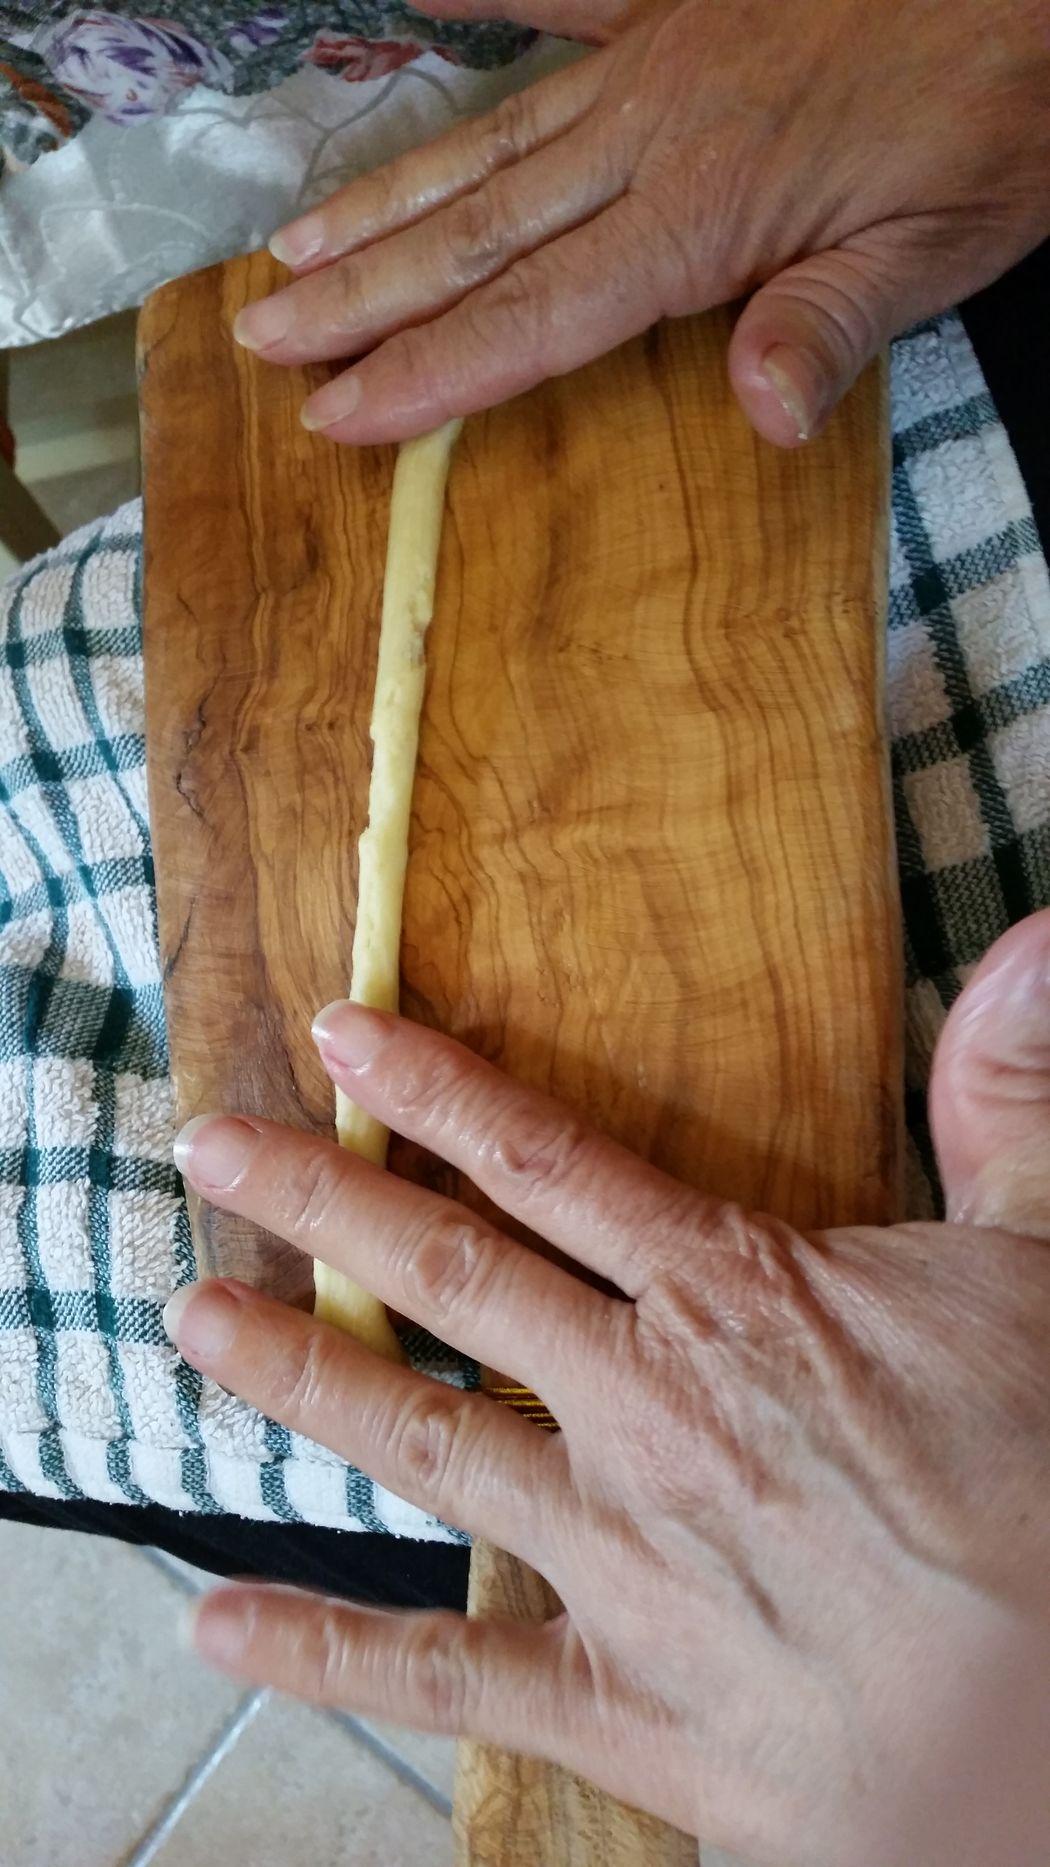 Abruzzo Traditions Coockies EyeEm Gallery Foodphotography Handmade Hands Taralli Wooden Cutting Board